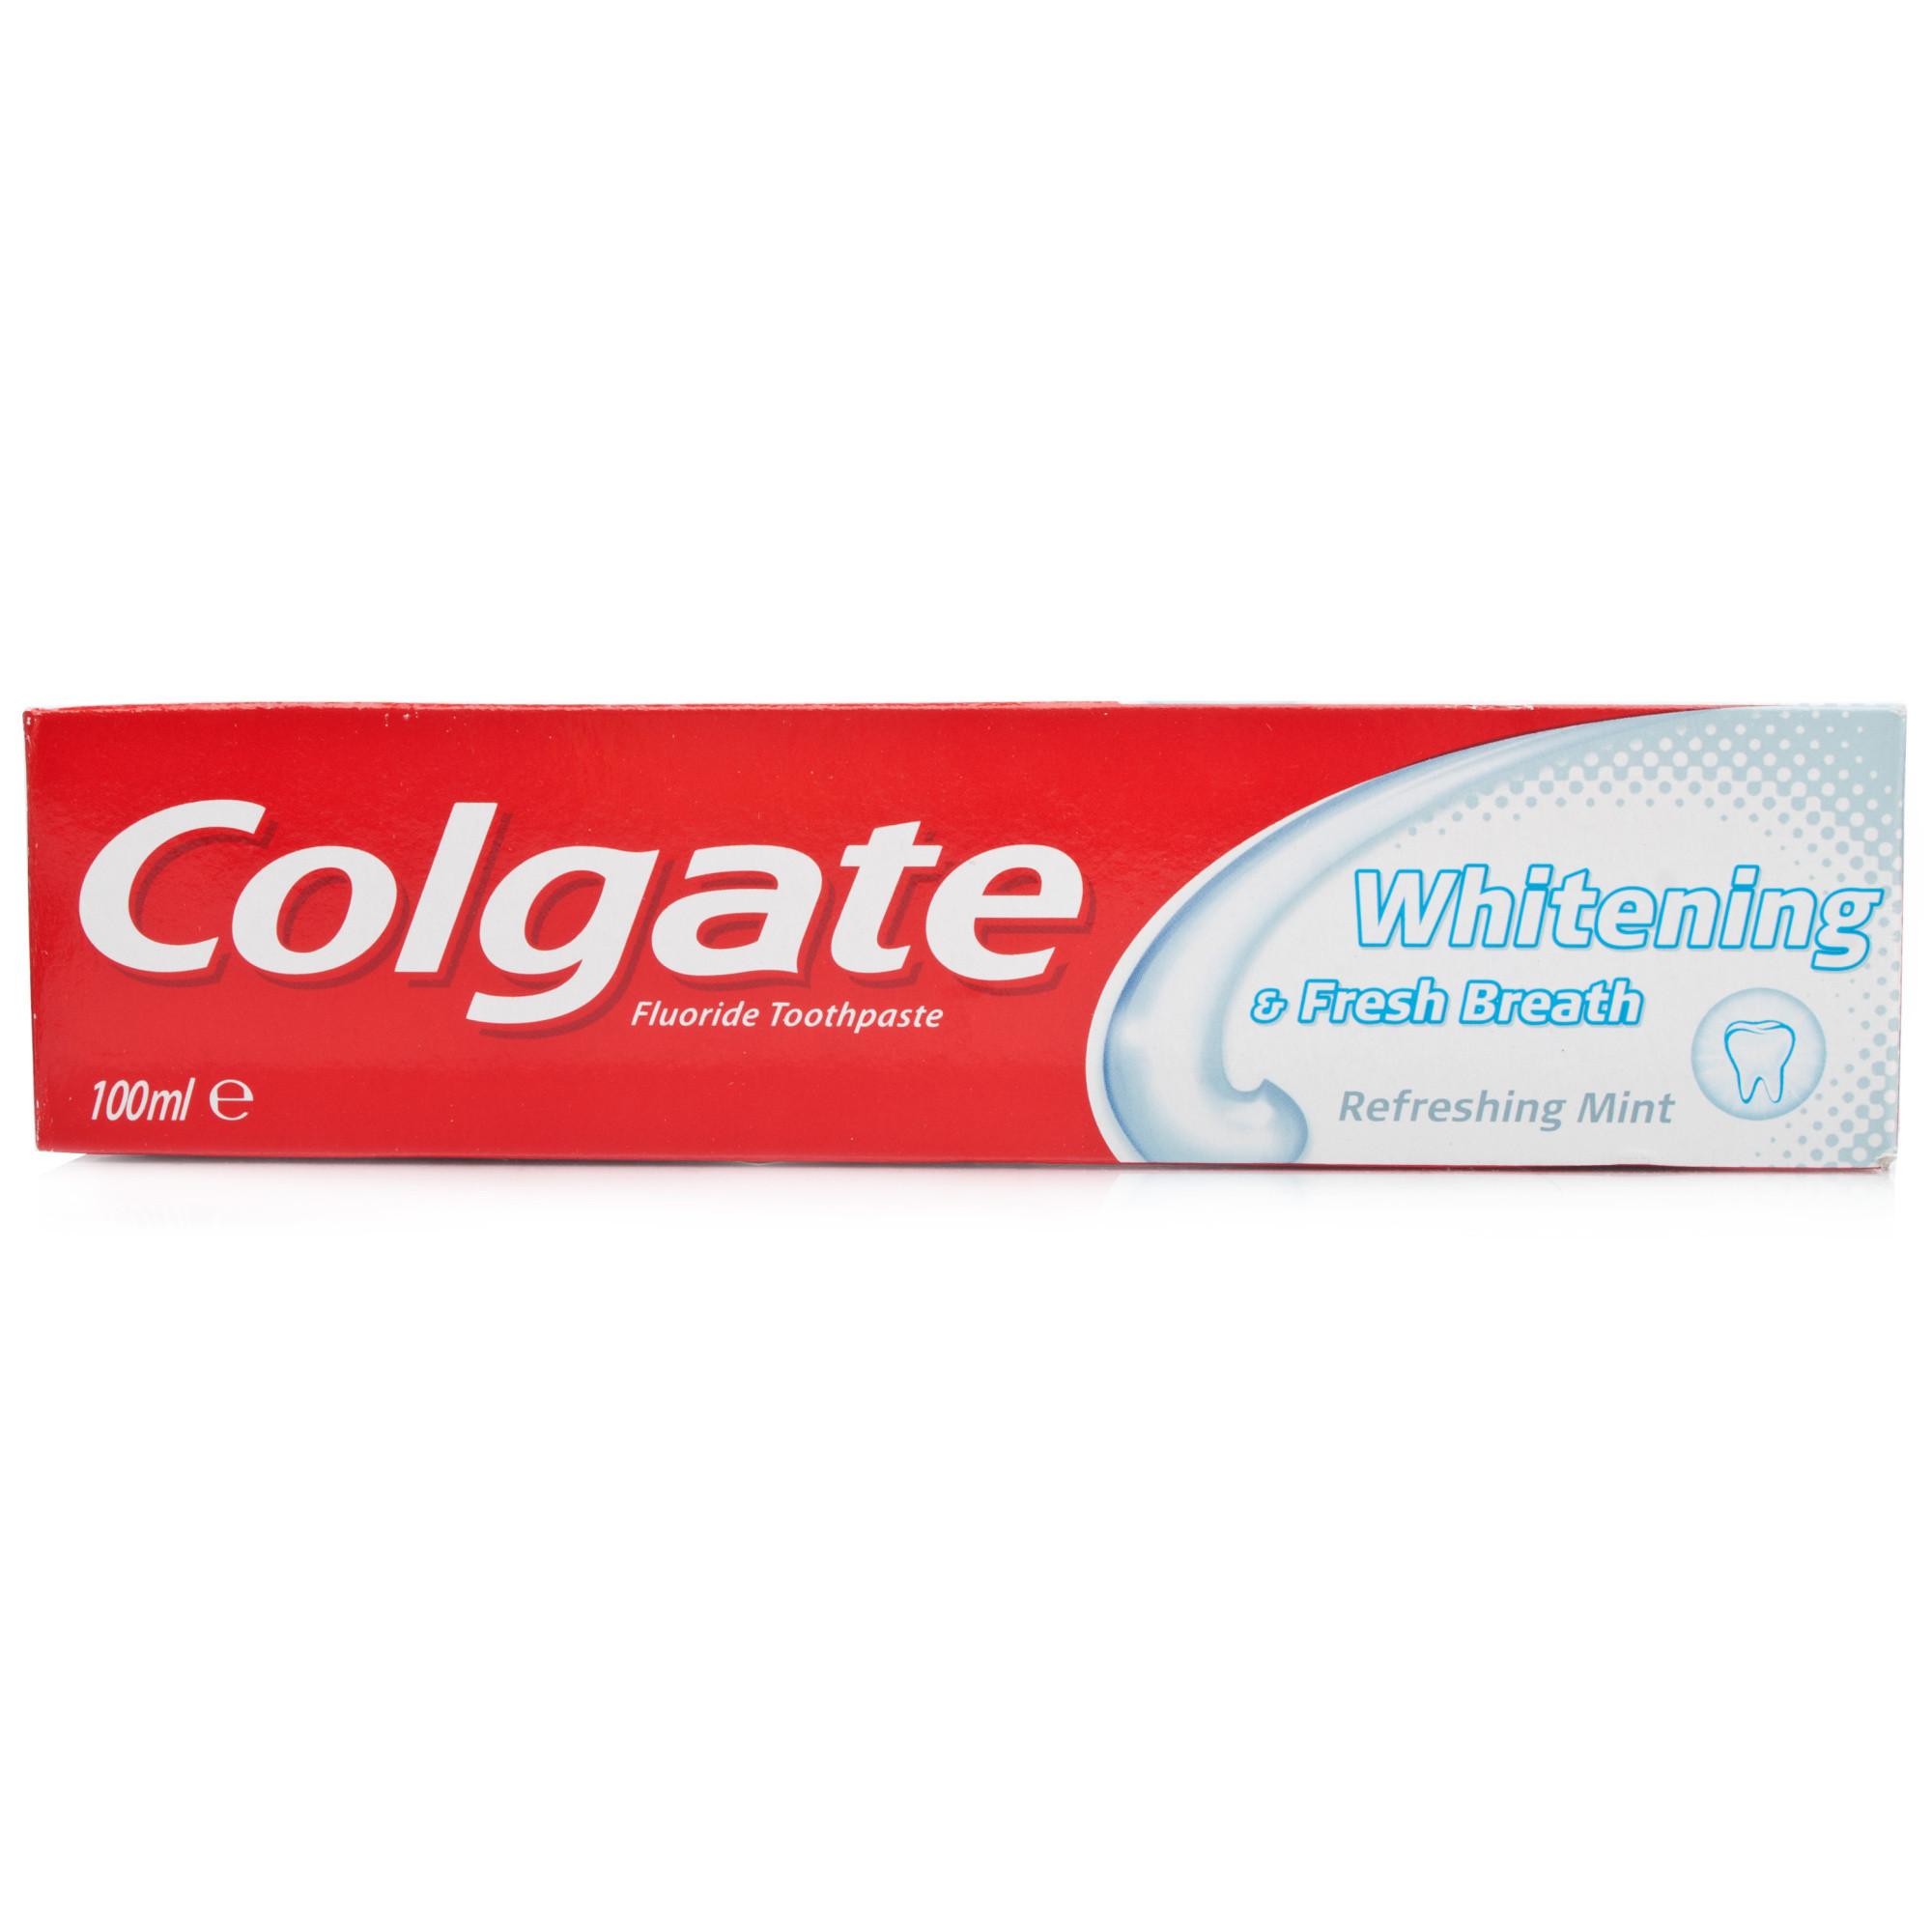 Colgate Whitening Amp Fresh Breath Toothpaste Chemist Direct